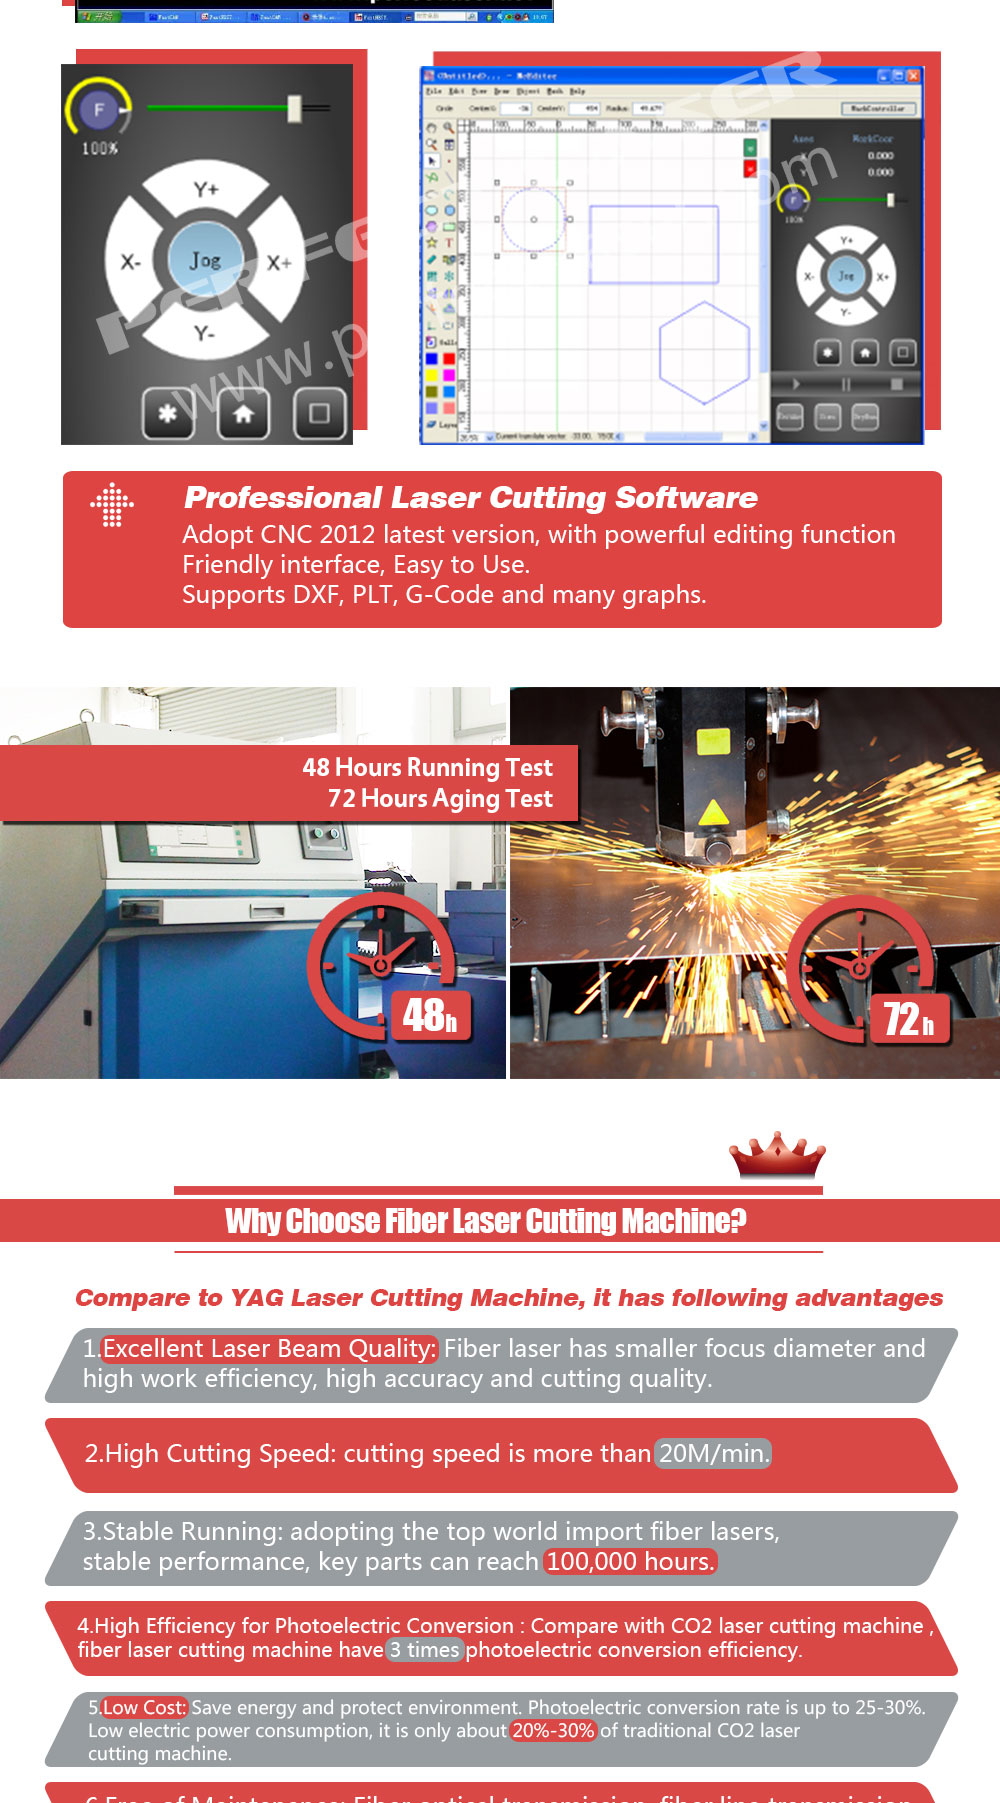 13 Perfect Laser-Fiber Laser Cutting Machine.jpg